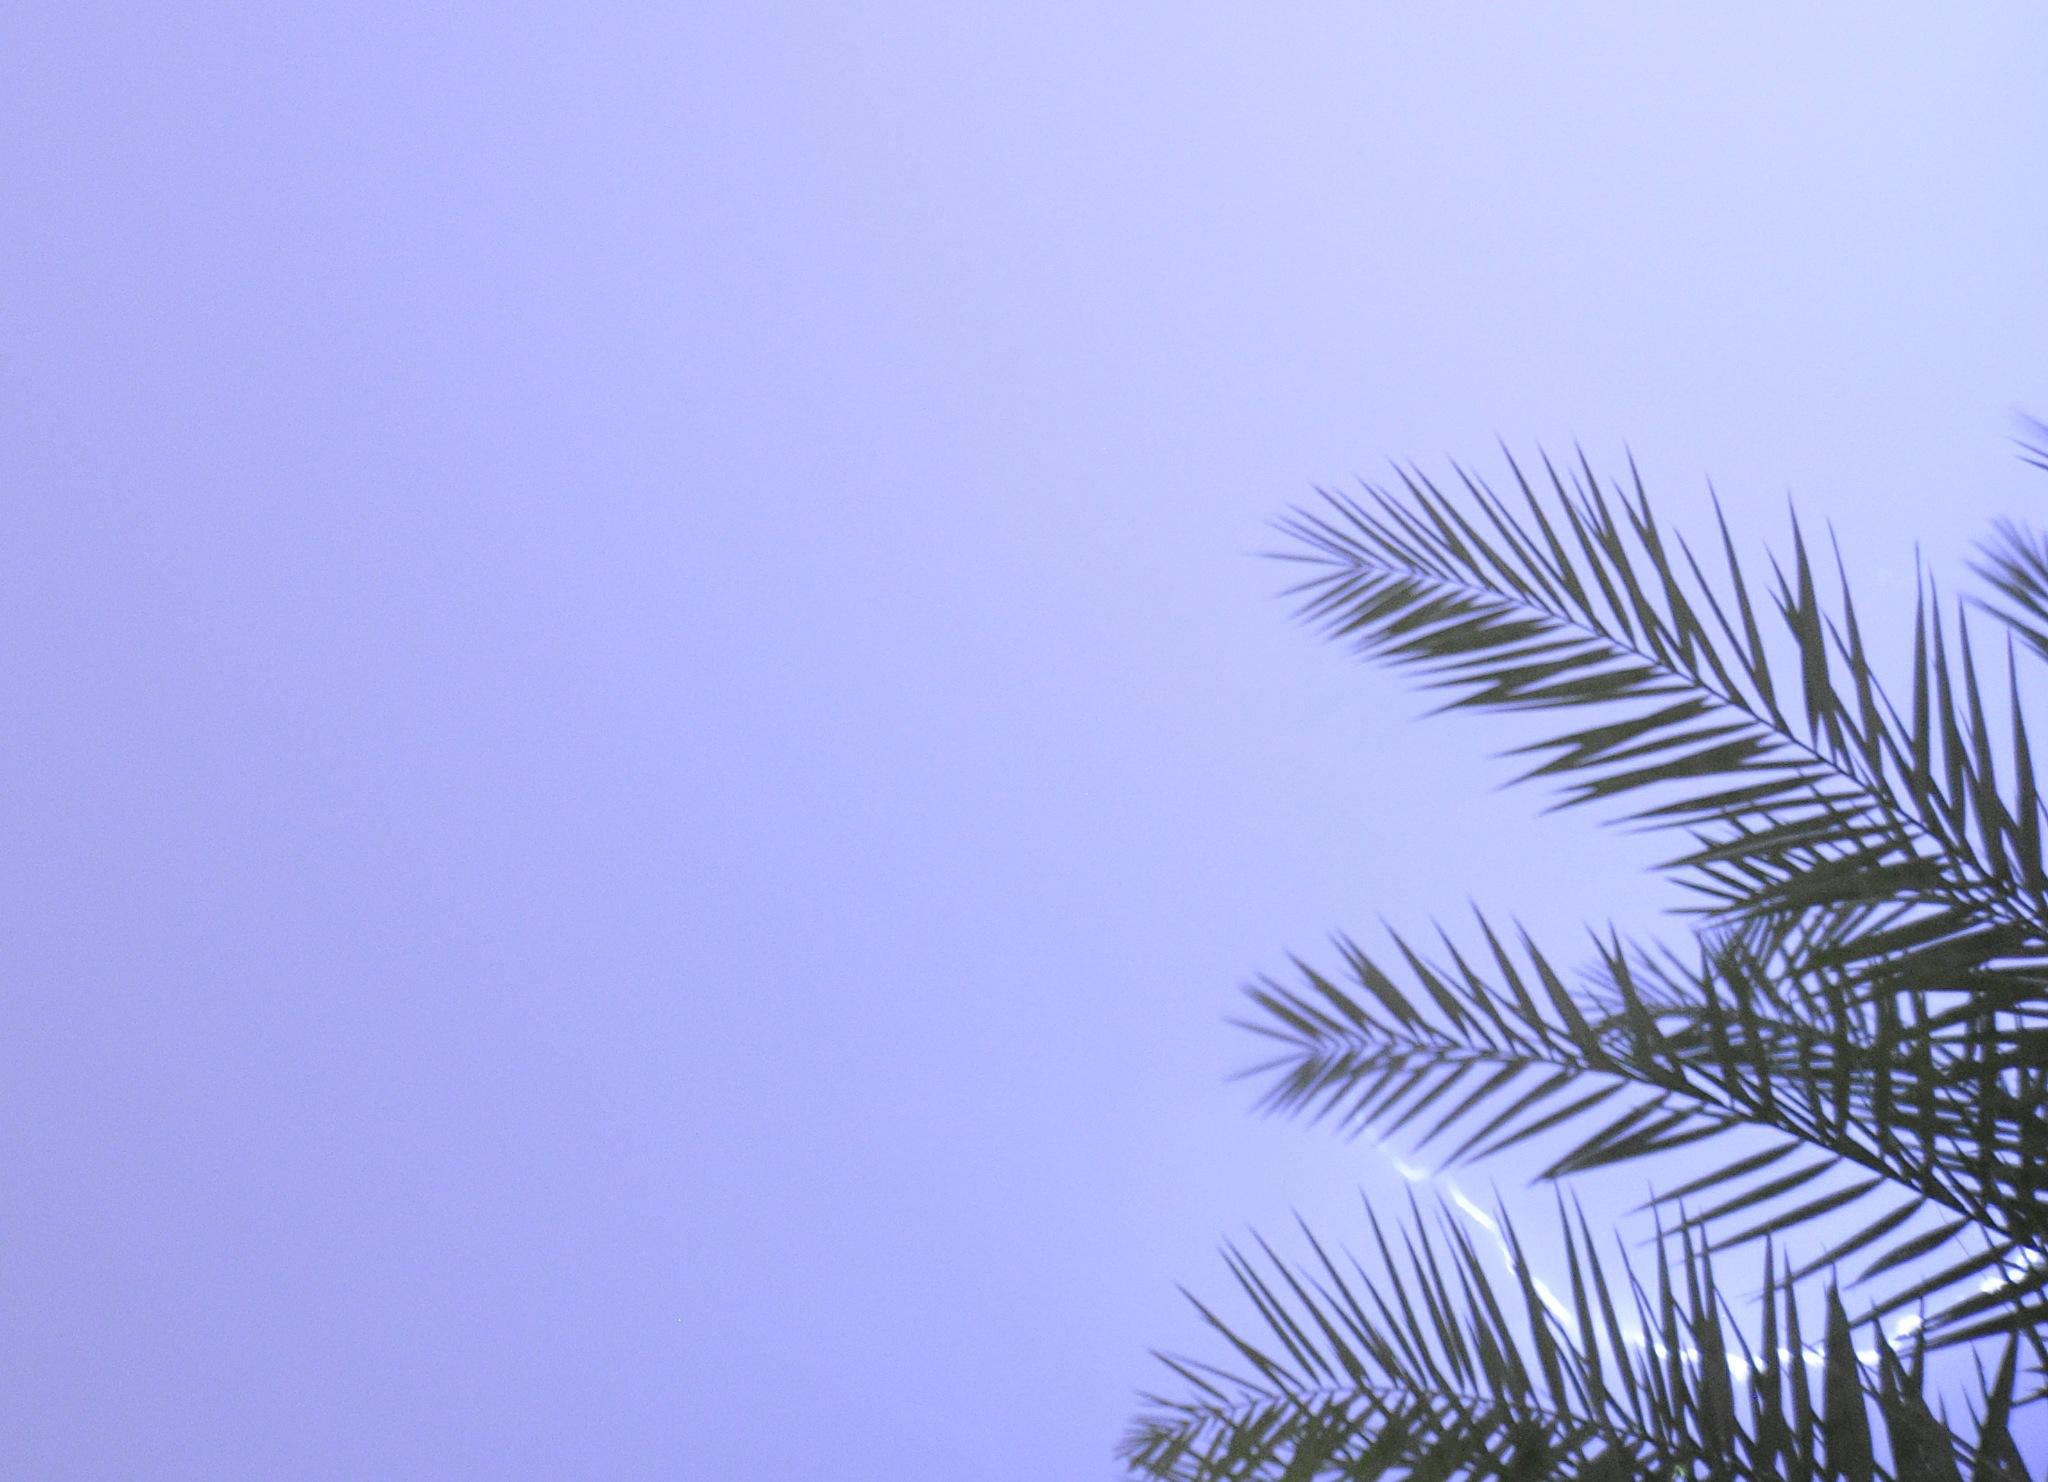 Lightening makes no sound until it strikes by Sadiq Ali AlQatari